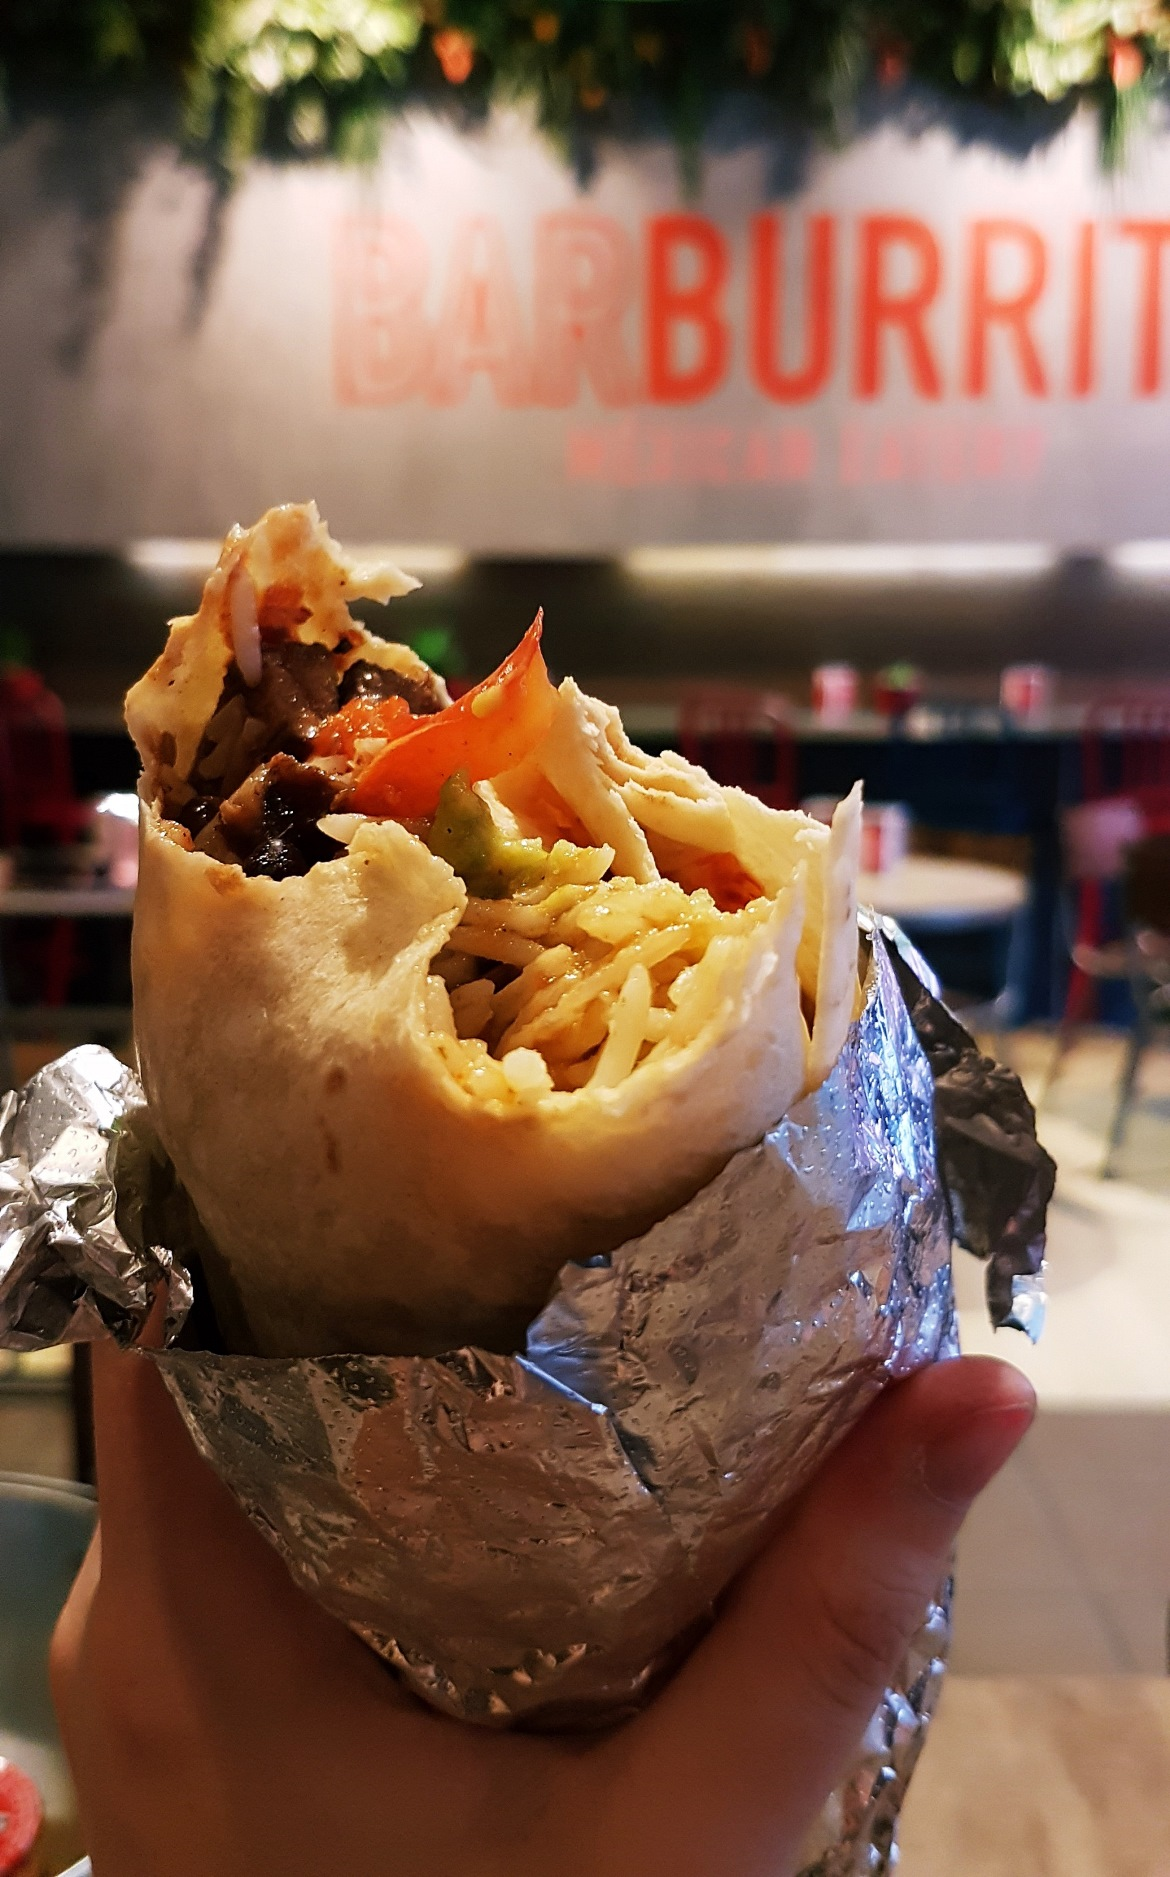 Half eaten burrito - Burrito Masterclass with Barburrito, review by BeckyBecky Blogs